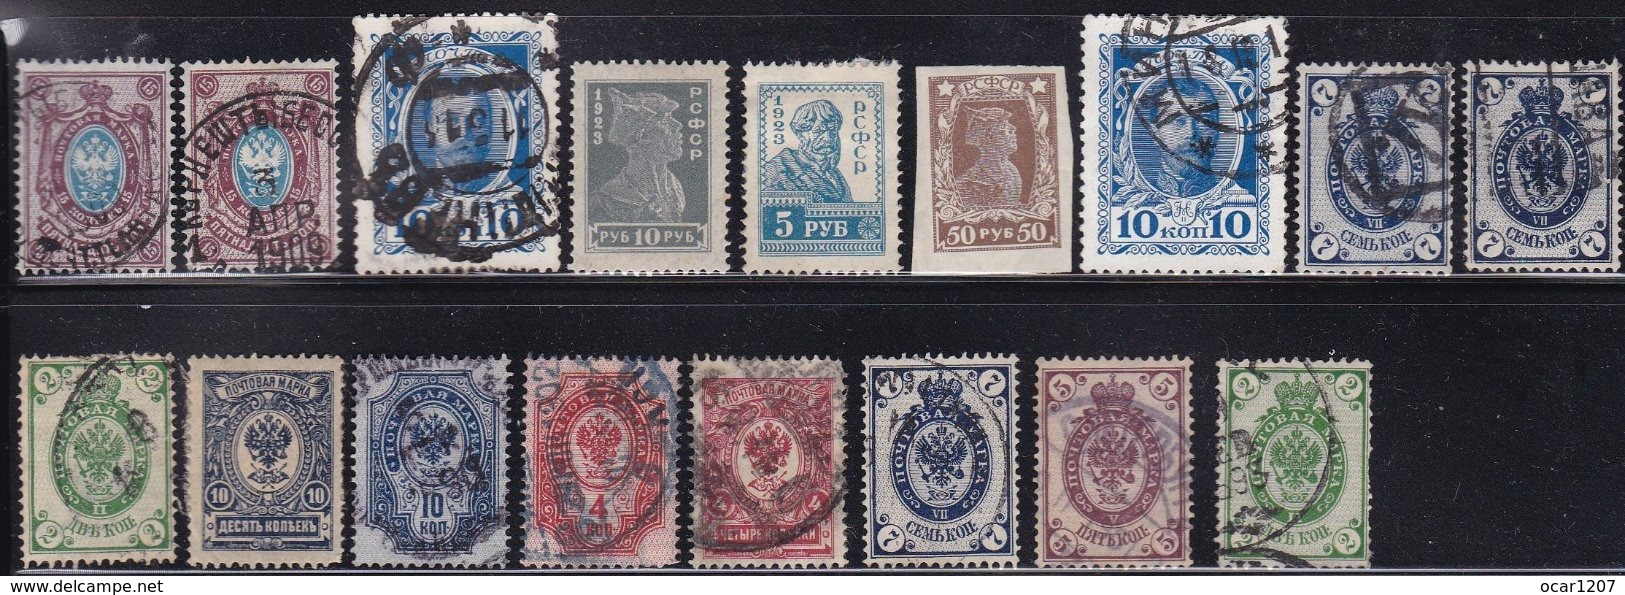 Lot 17 Used And Mint - 1917-1923 Republic & Soviet Republic